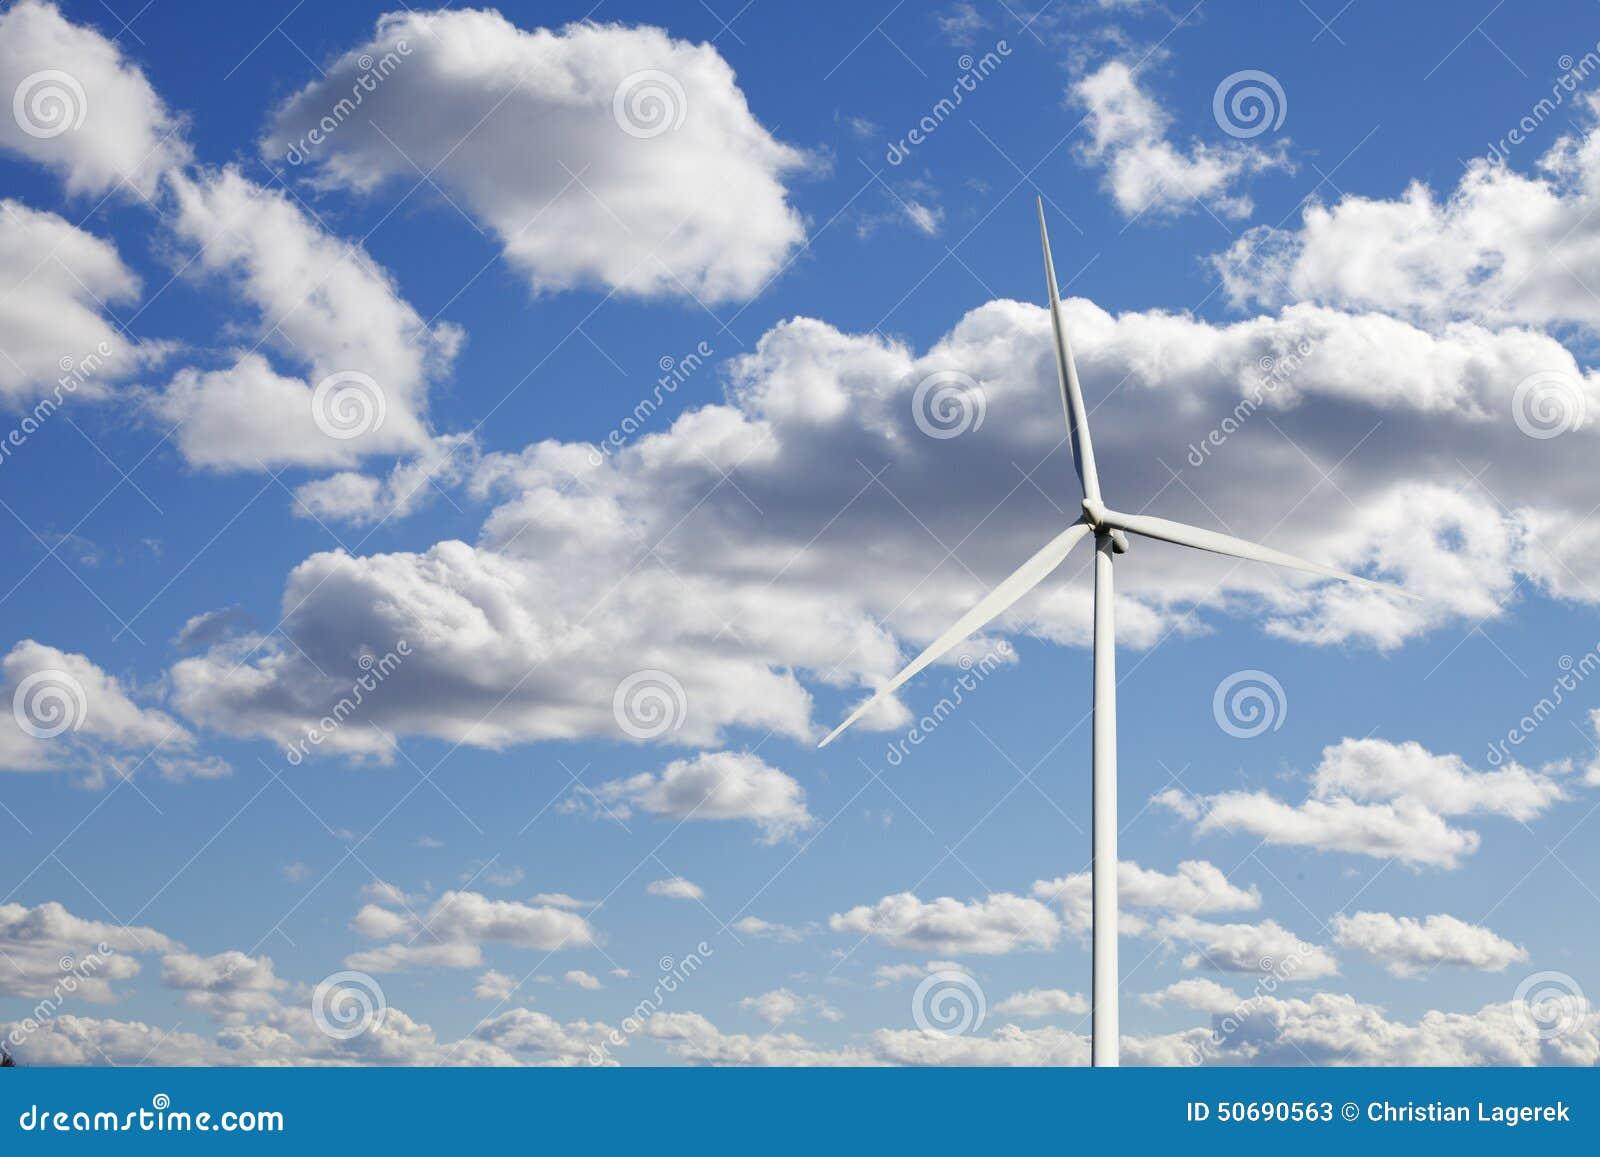 Download 风力涡轮和蓝天 库存图片. 图片 包括有 云彩, 蓝色, 次幂, 成块, 结算, 空白, 工厂, 能源, 天空 - 50690563